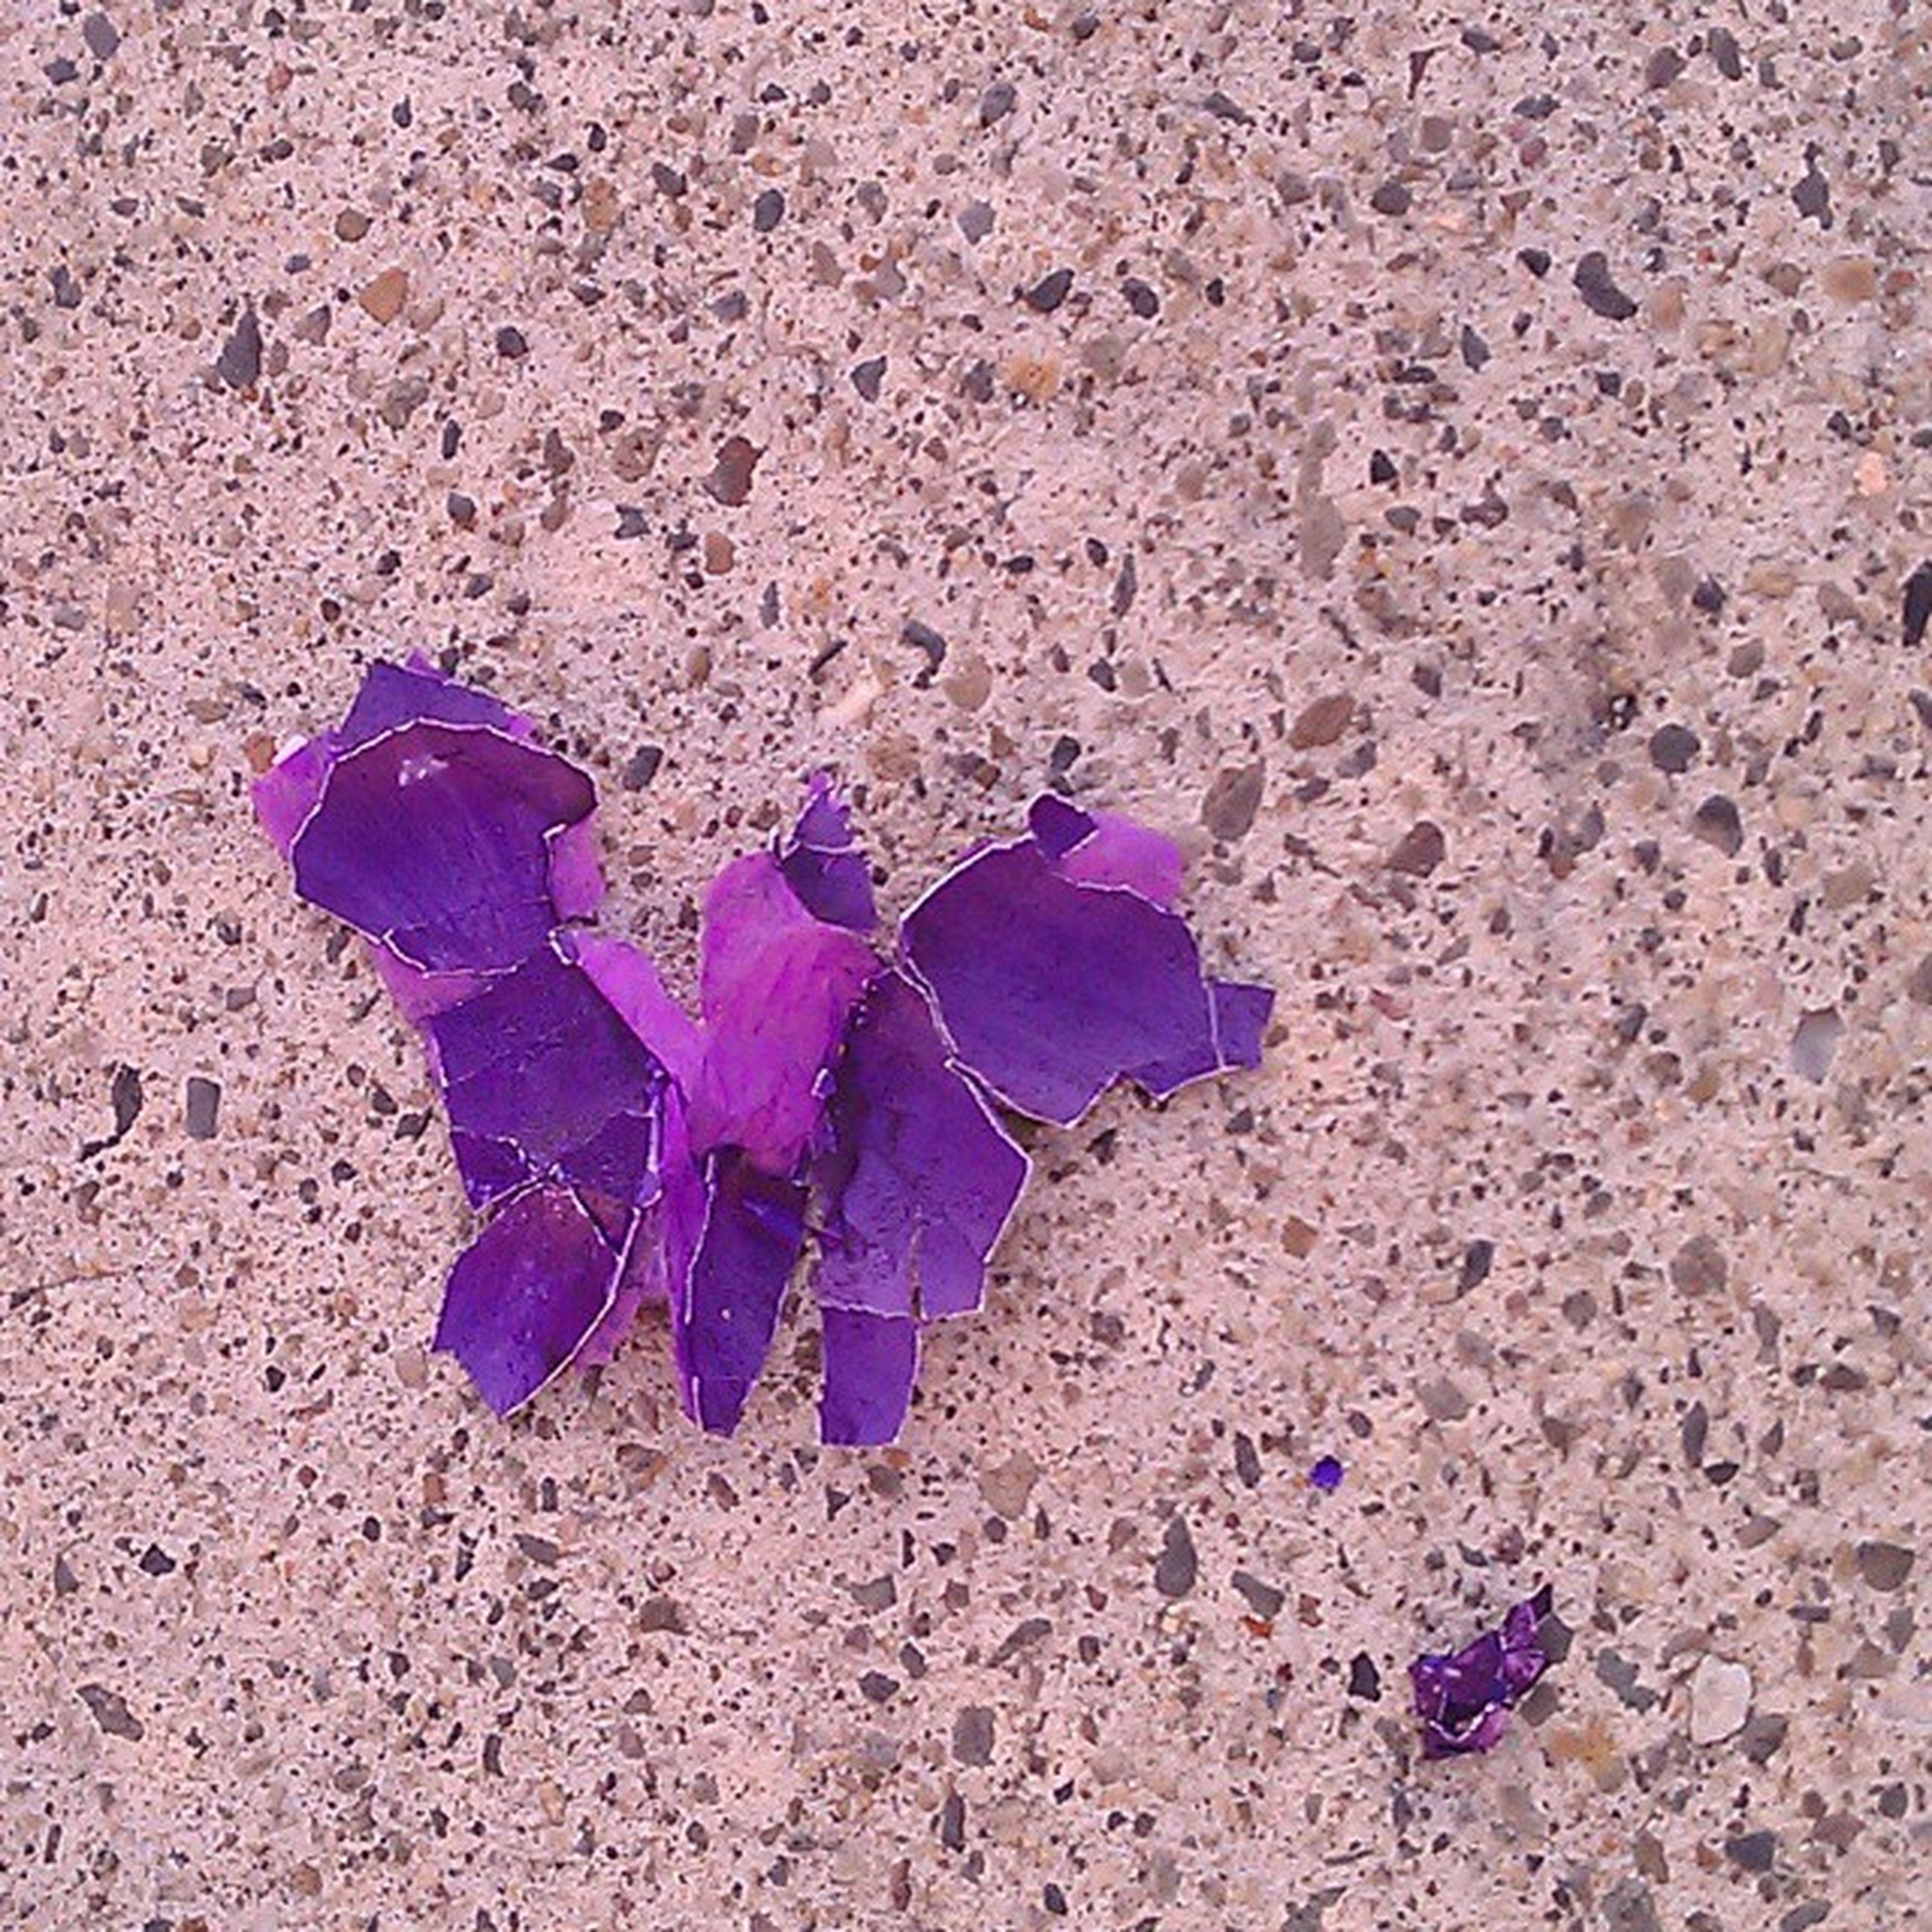 Fallen angel Purpletuesday Minimalism Blossom Beneathyourfeet Flower Nothingisordinary POV Tdj_101